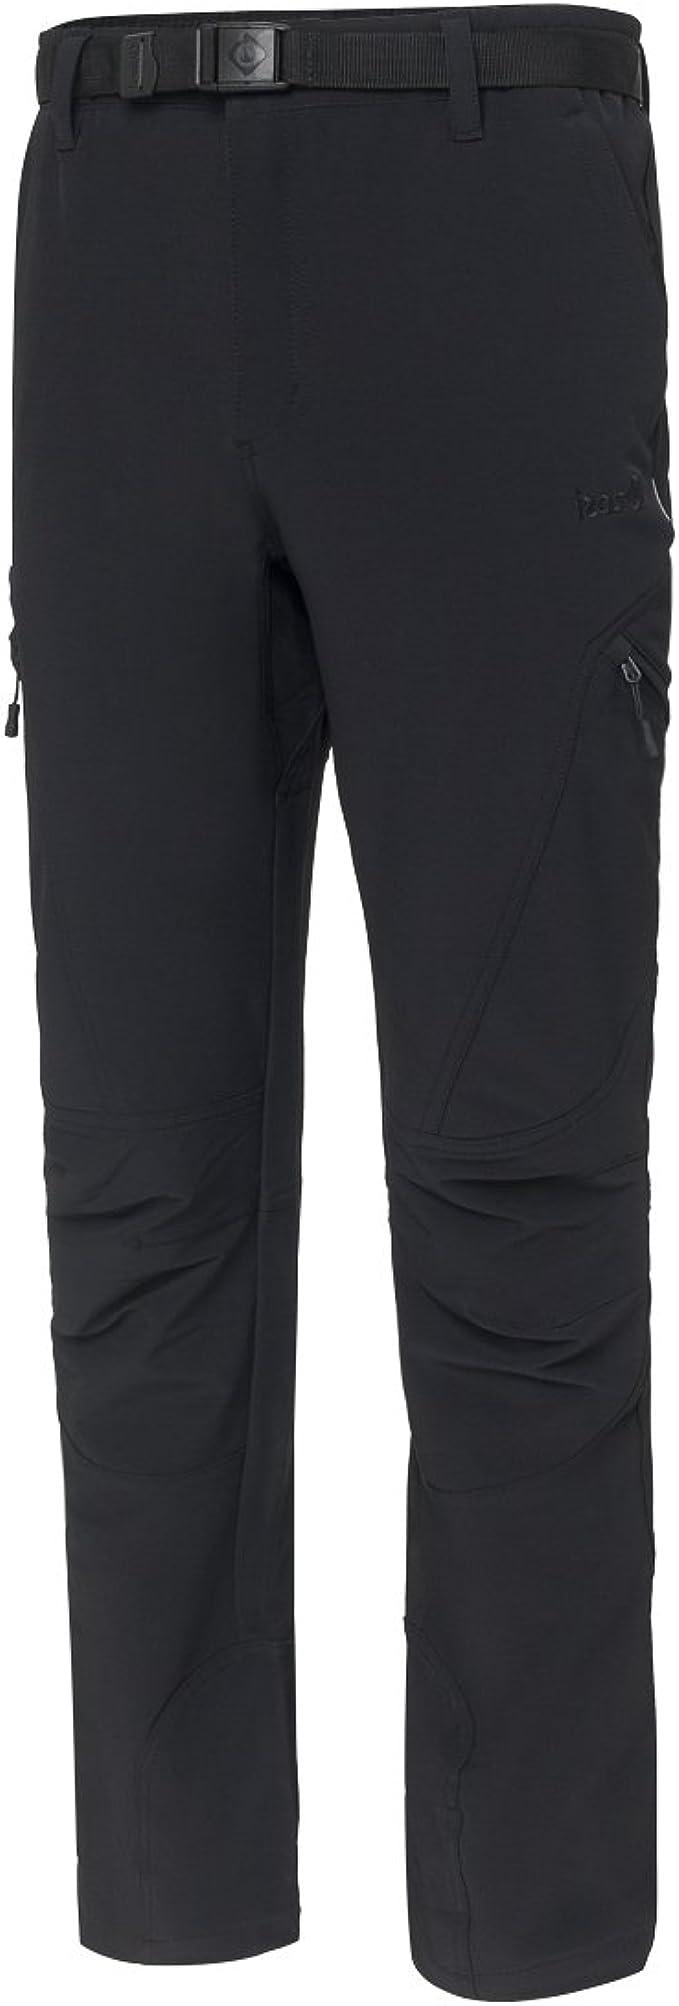 Pantaloni di Montagna Uomo IZAS Grouser